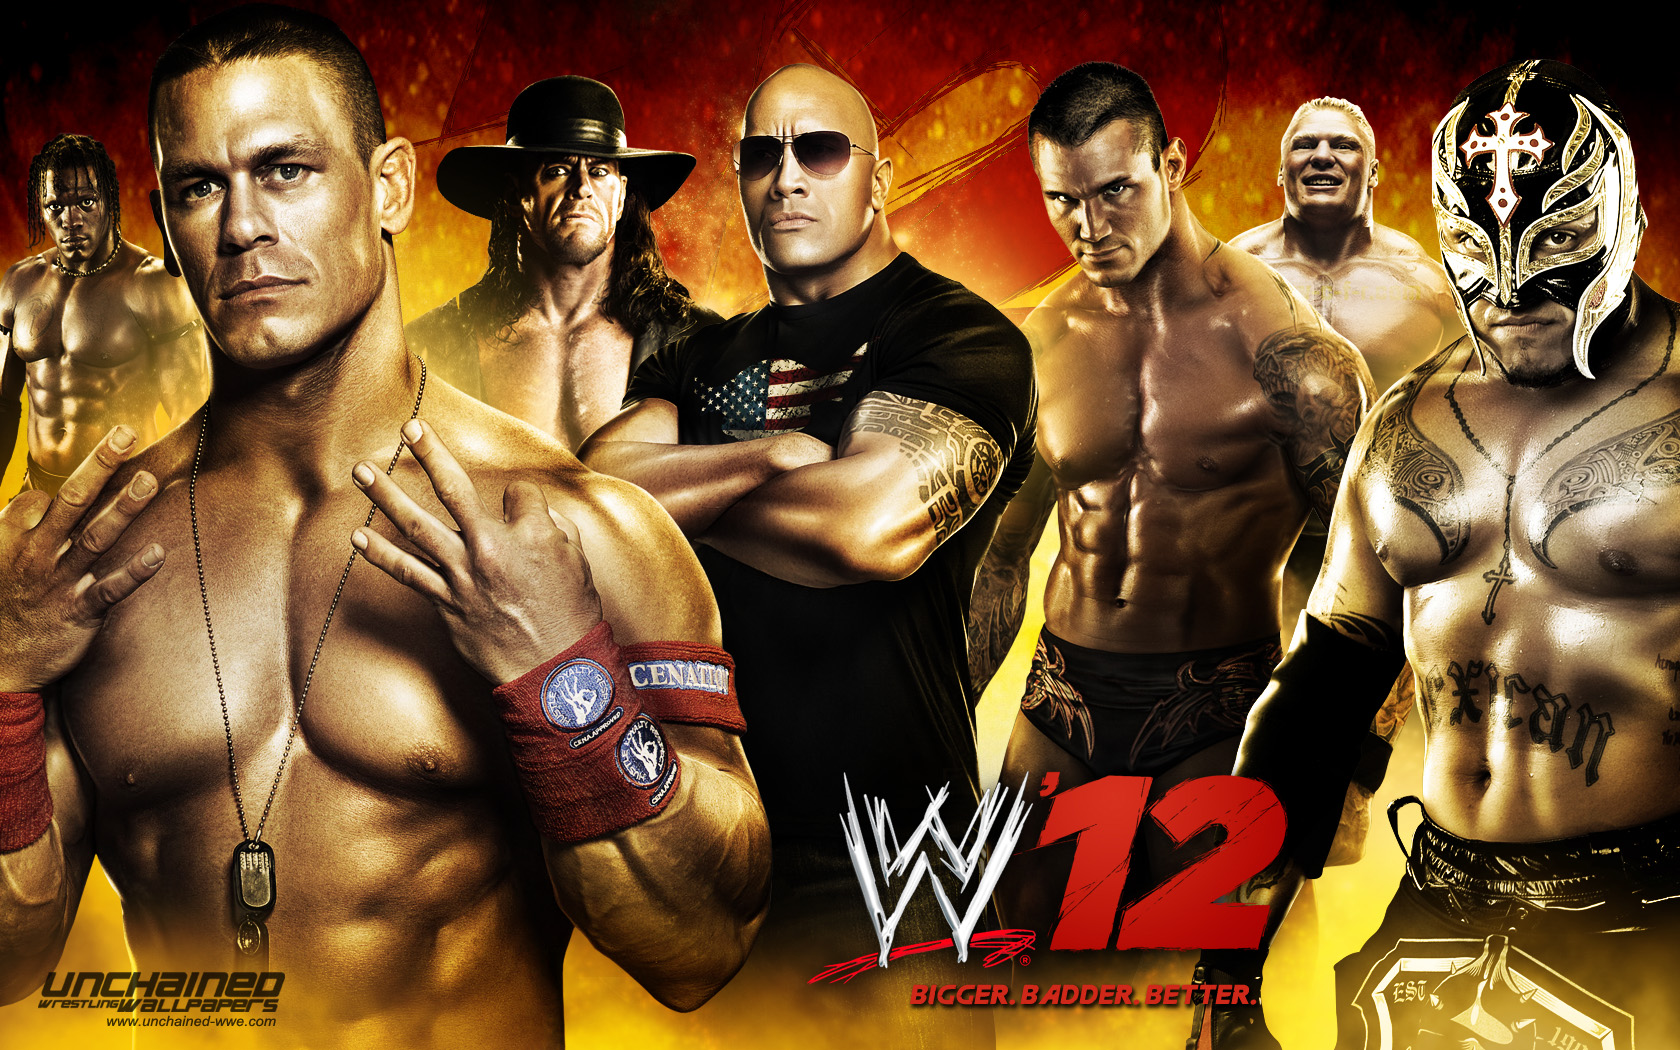 WWE images WWE 12 wallpaper photos 31658858 1680x1050